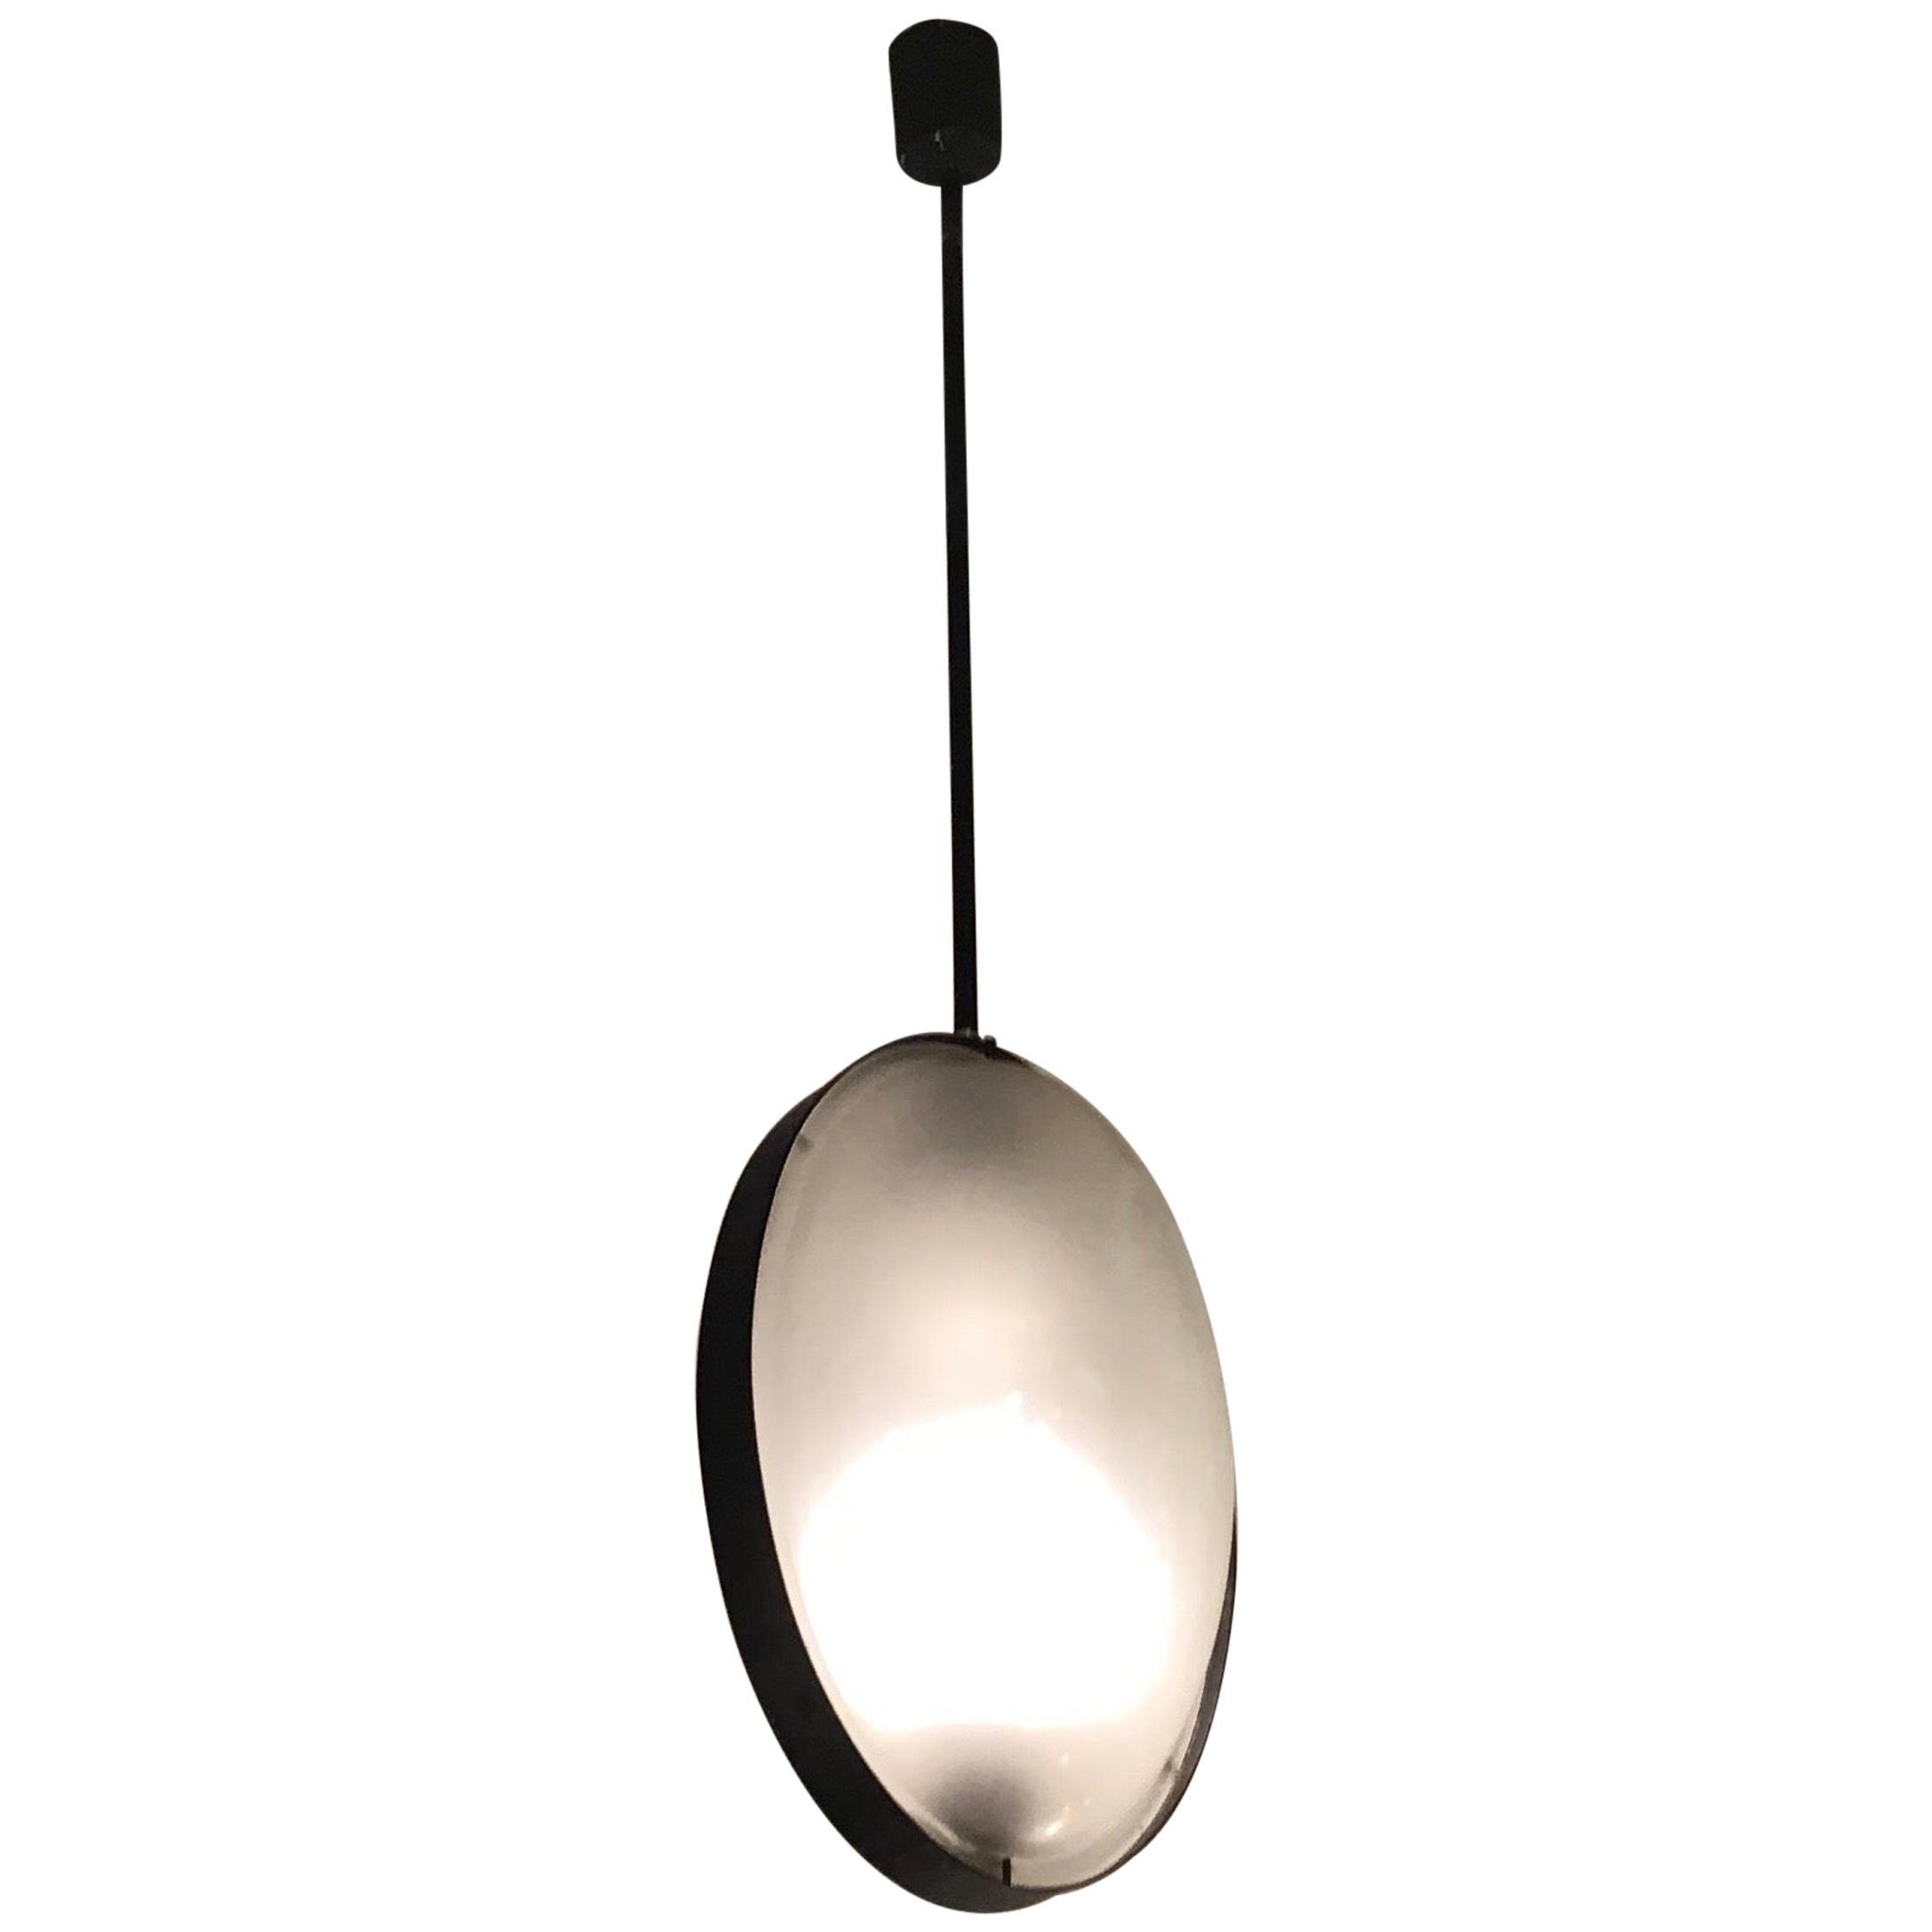 "Luigi Caccia Dominioni ""Stile"" Chandelier Glass Iron, 1960, Italy"